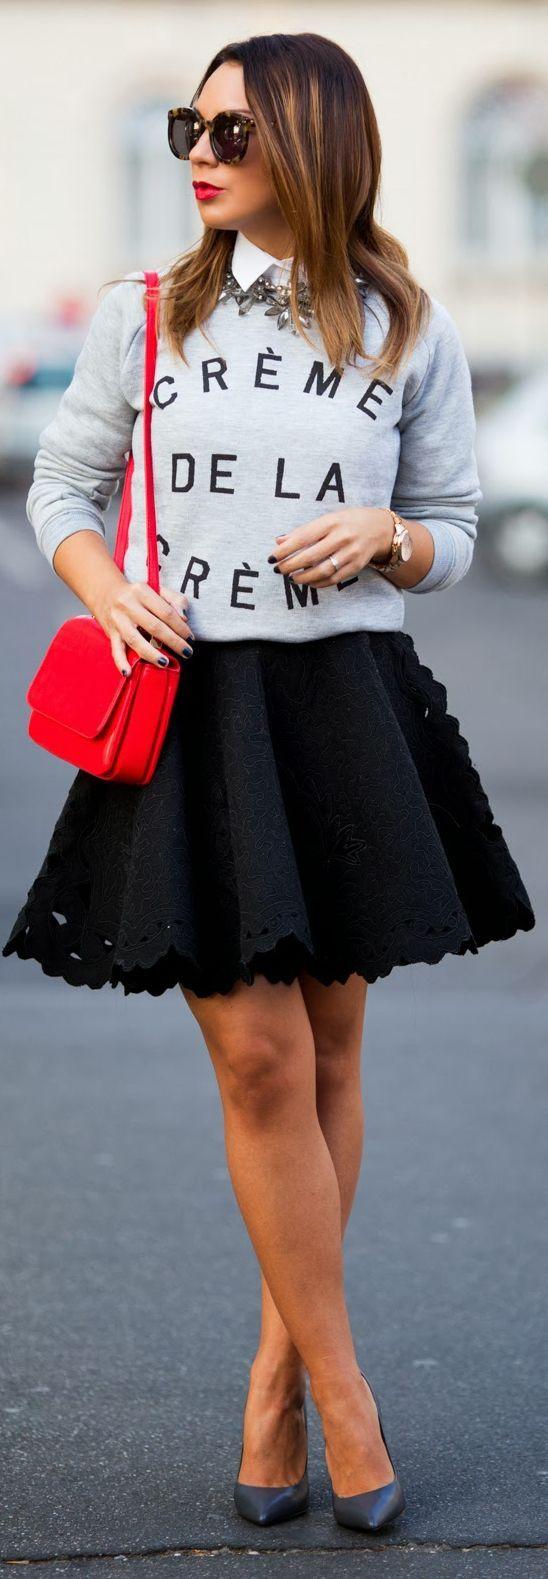 Full skirt + sweatshirt